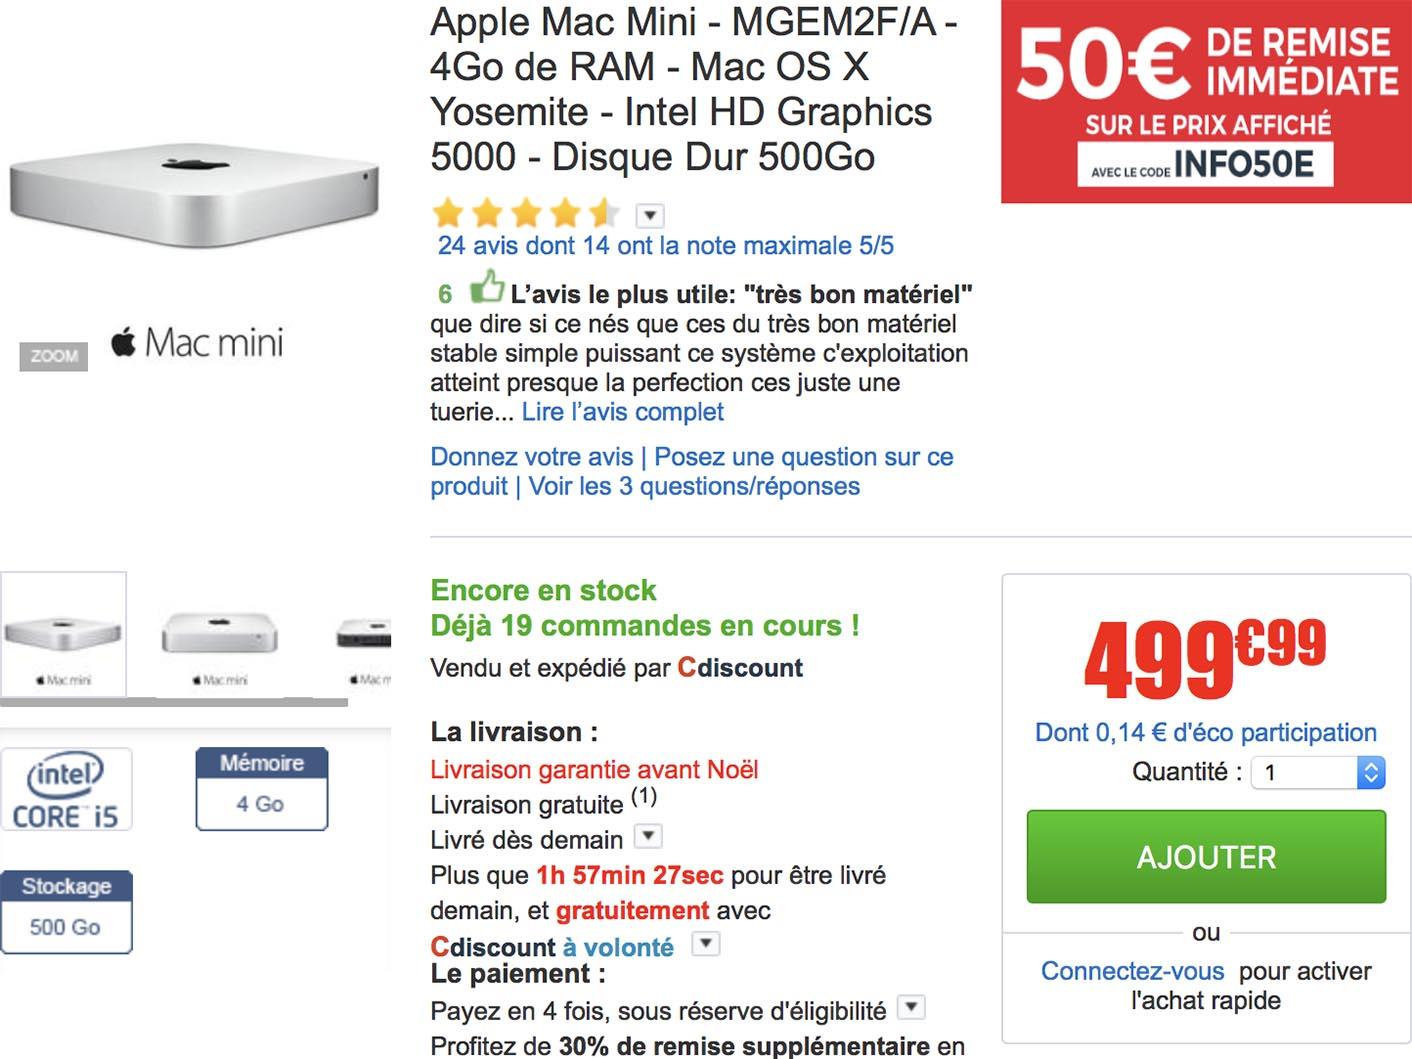 Mac mini promo CDiscount